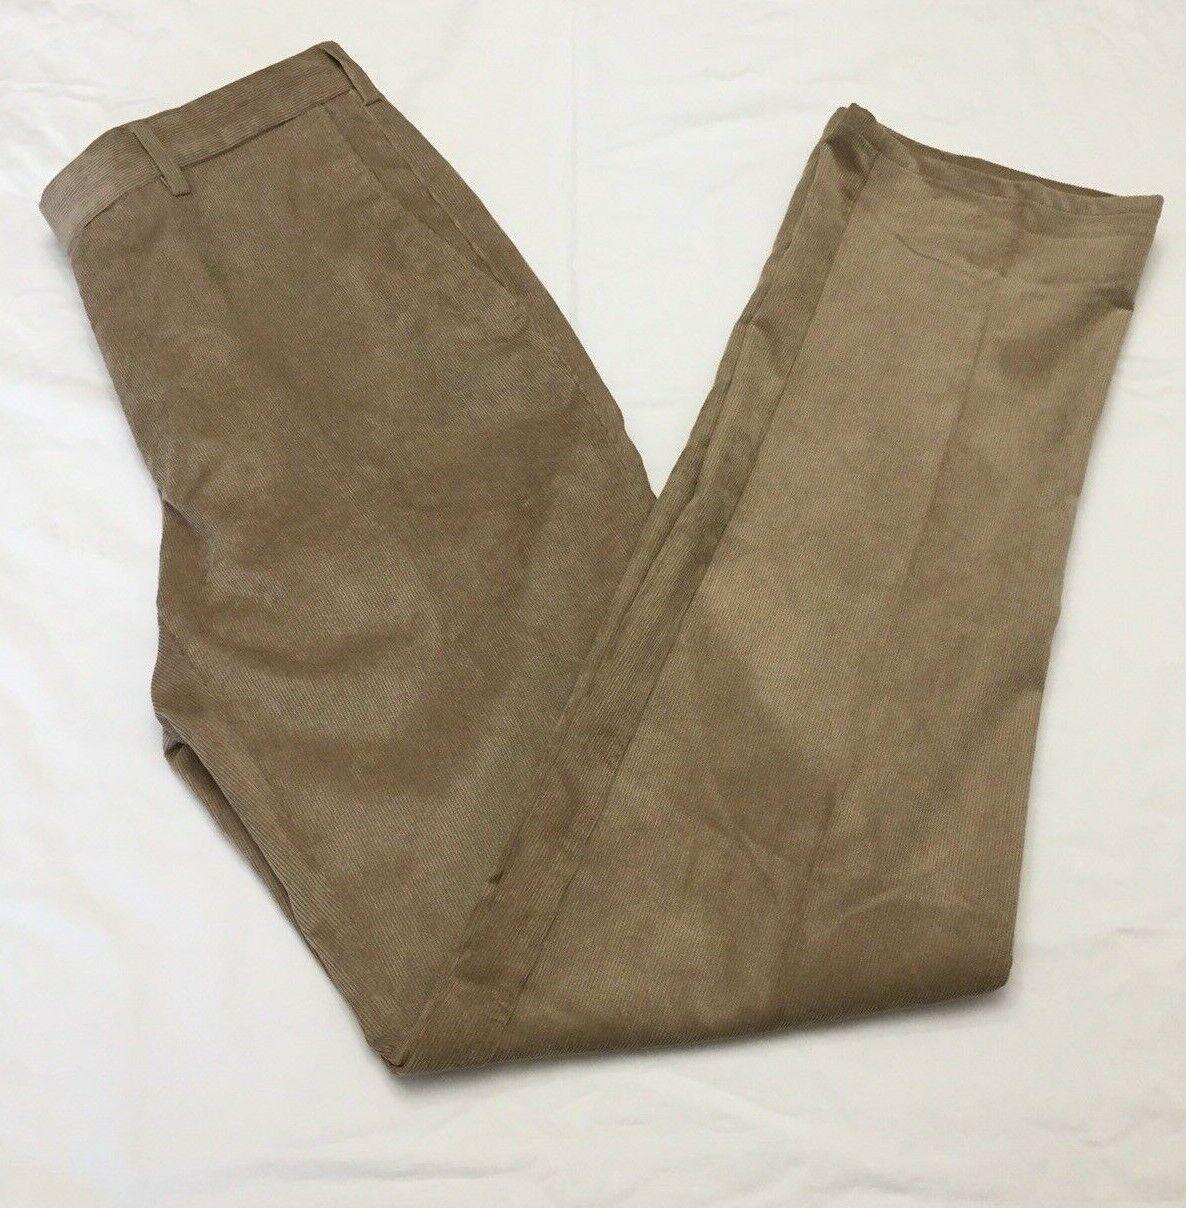 Peter Millar Mens 32x35 Nanoluxe Corduroy Pants Tan